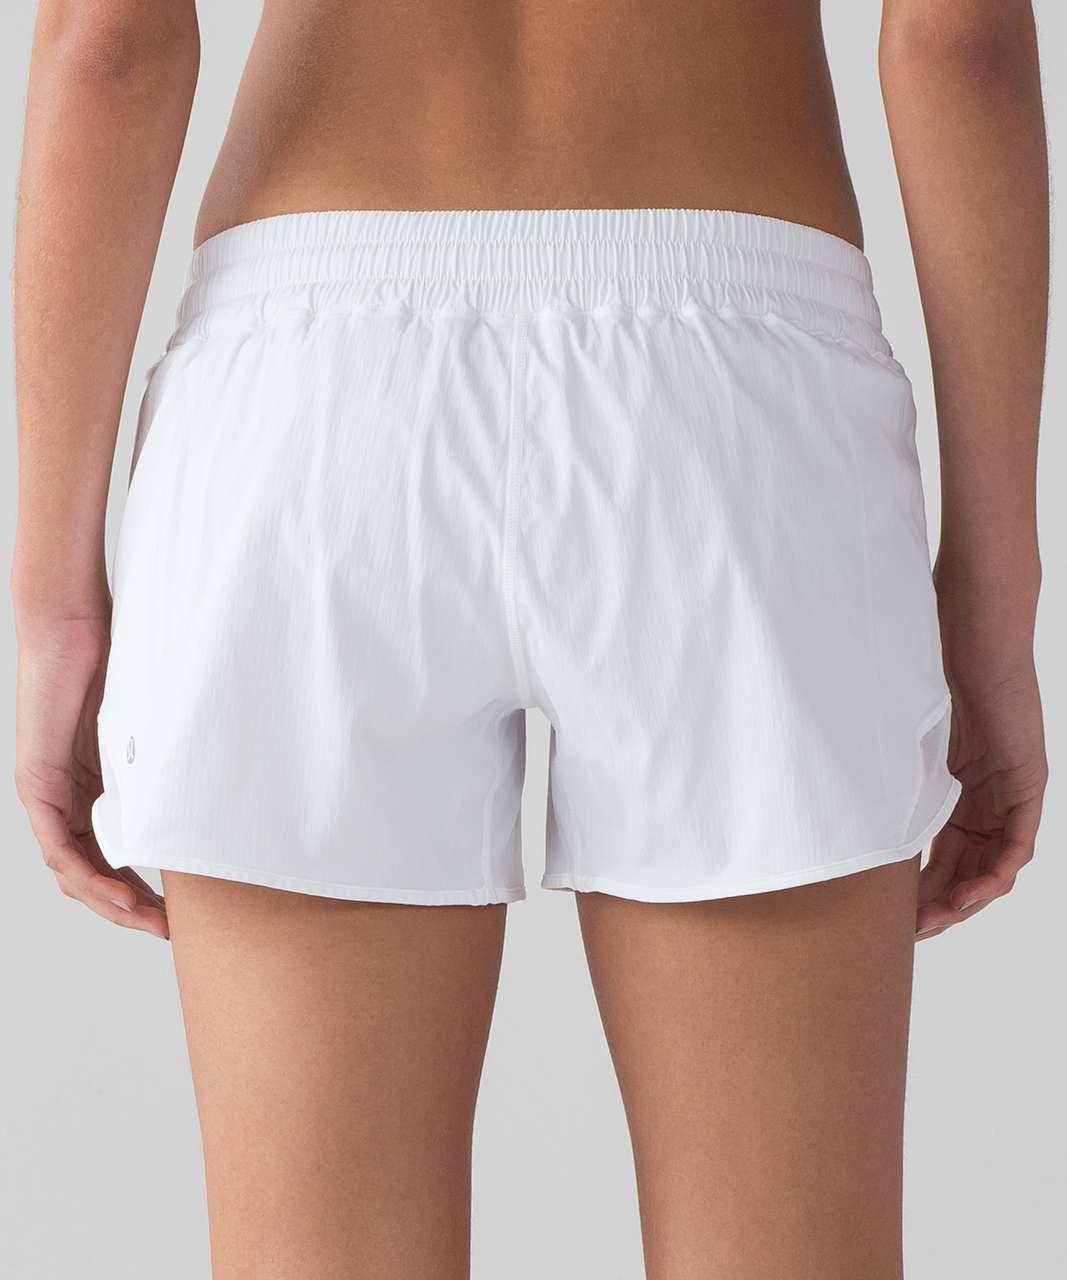 "Lululemon Hotty Hot Short II (Long 4"") - White / Barely Beige"